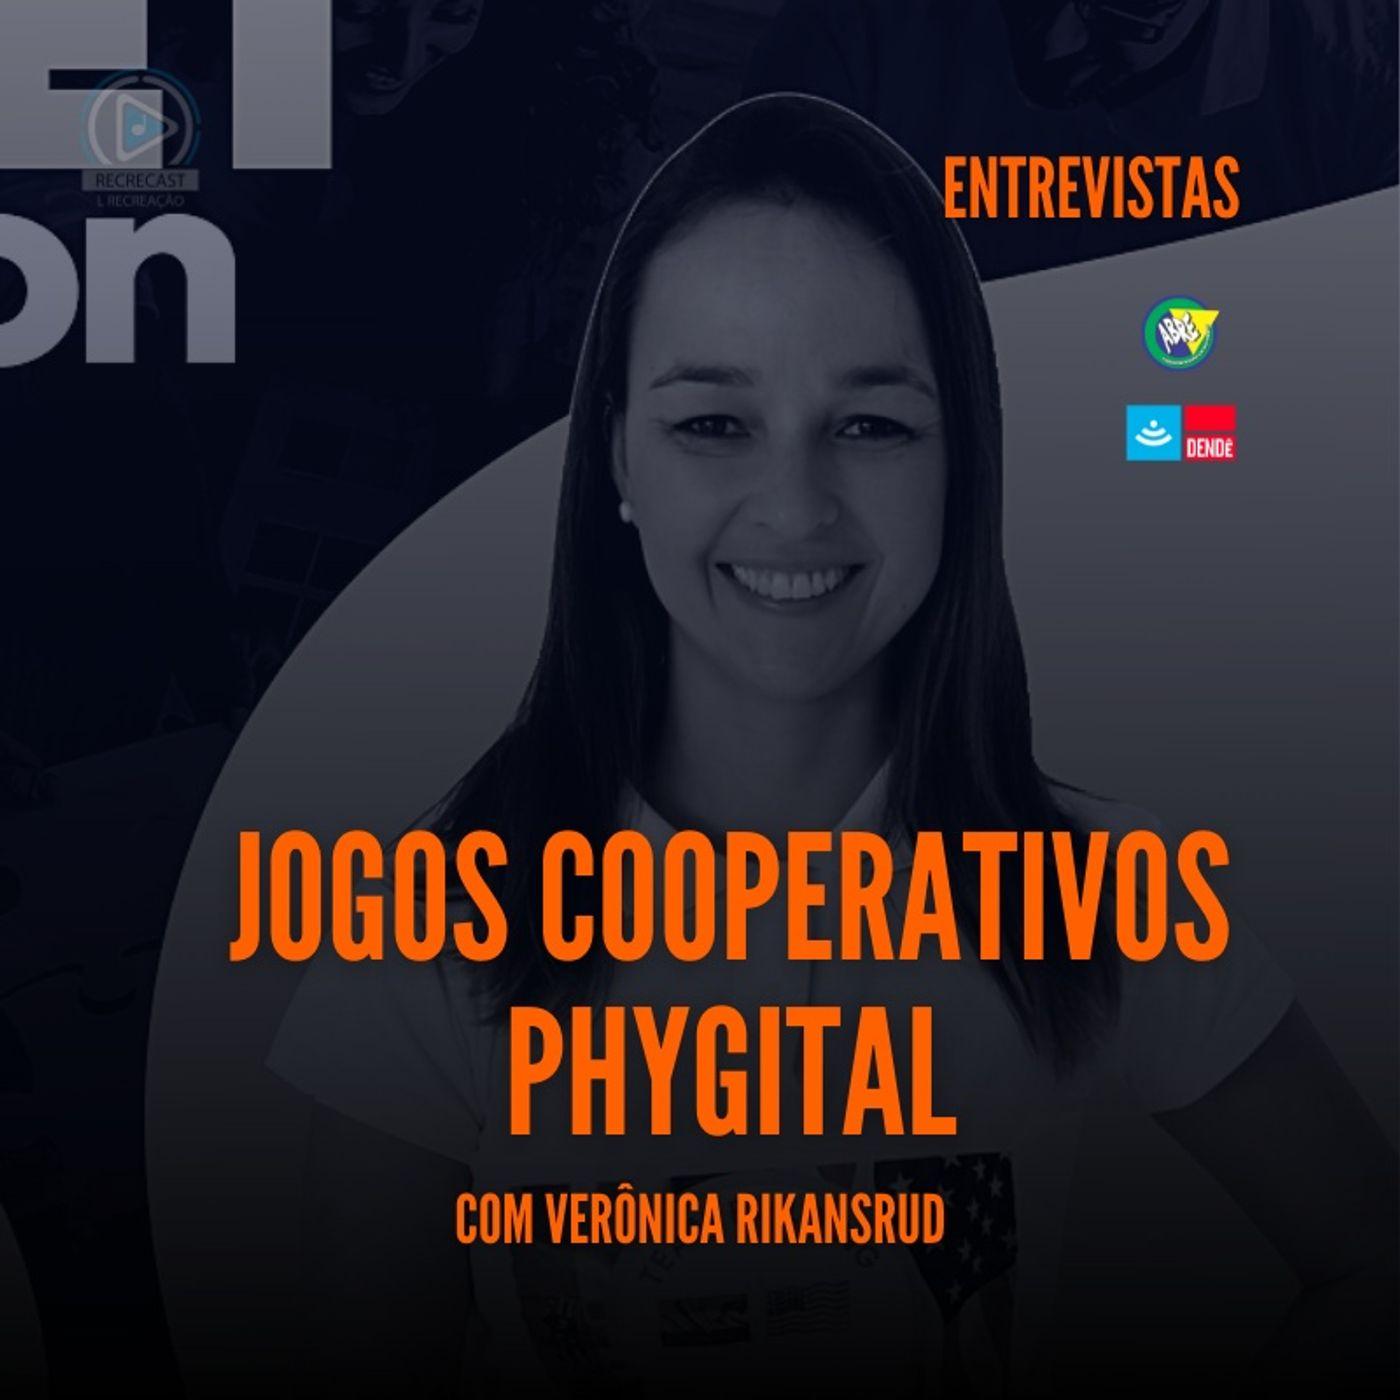 Jogos Cooperativos Phygital